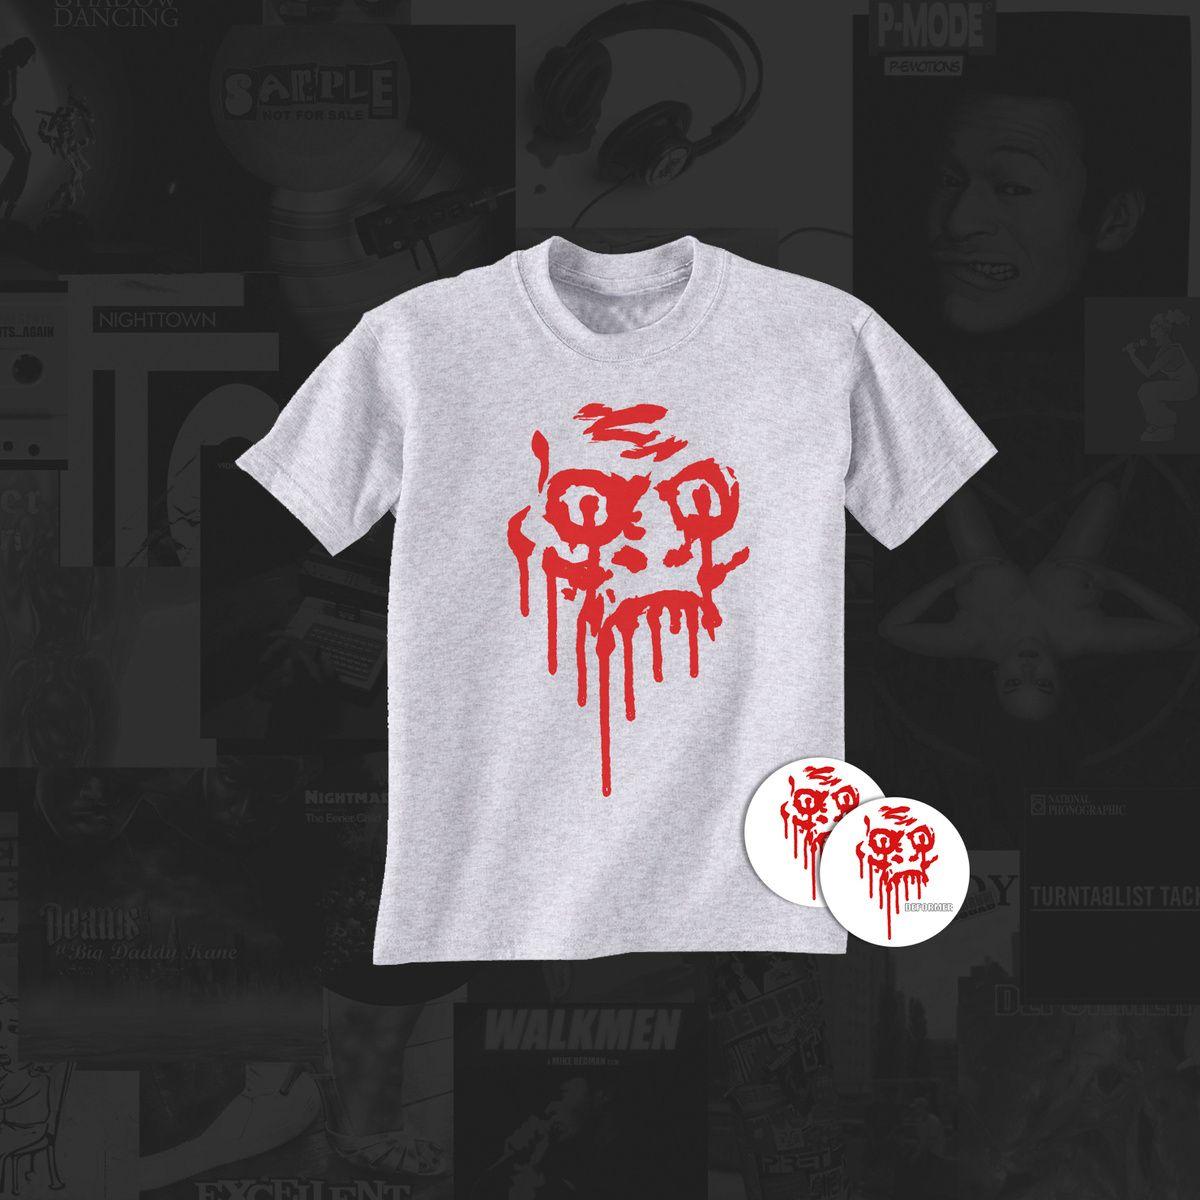 DEFORMER Hybrid T-Shirt +free Serato stickers | REDRUM RECORDZ